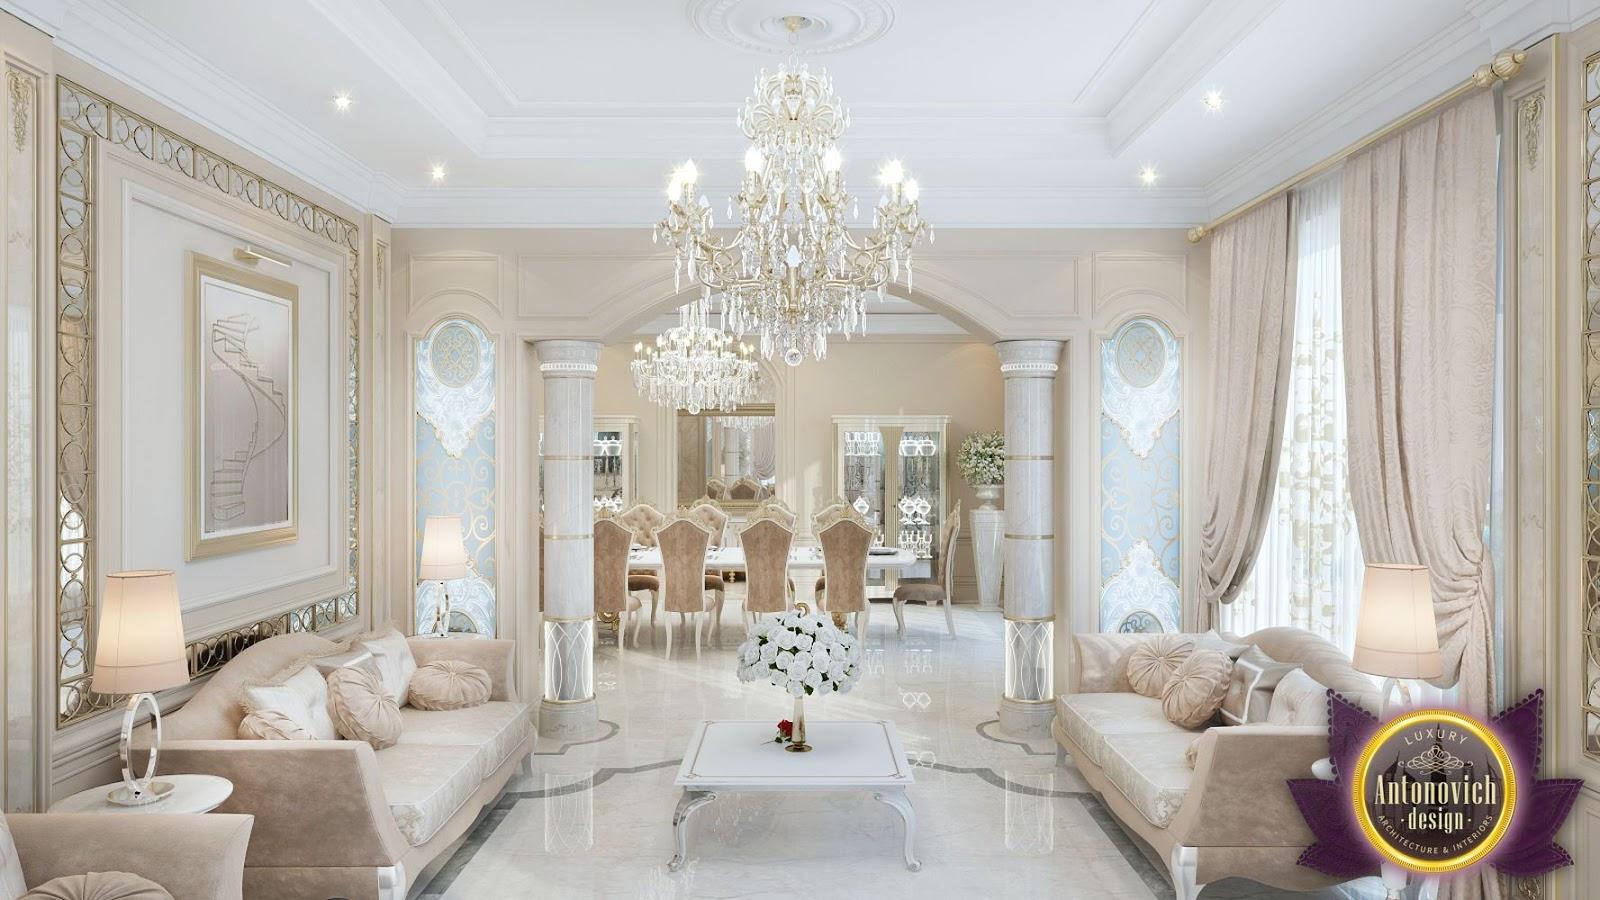 Kenyadesign: Interior design living room by Katrina Antonovich